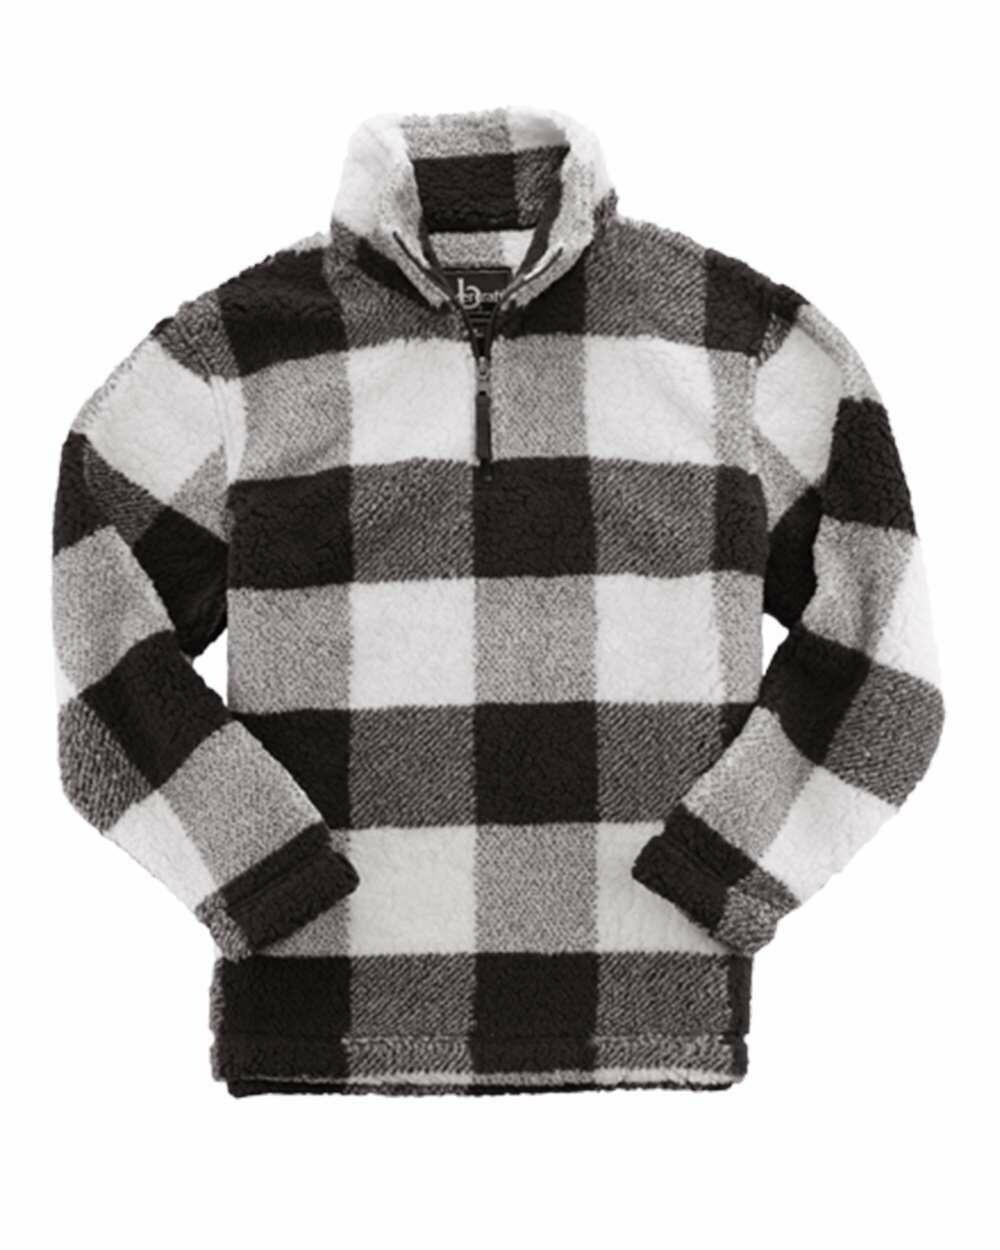 Unisex Plaid Sherpa Fleece Quarter-Zip Pullover